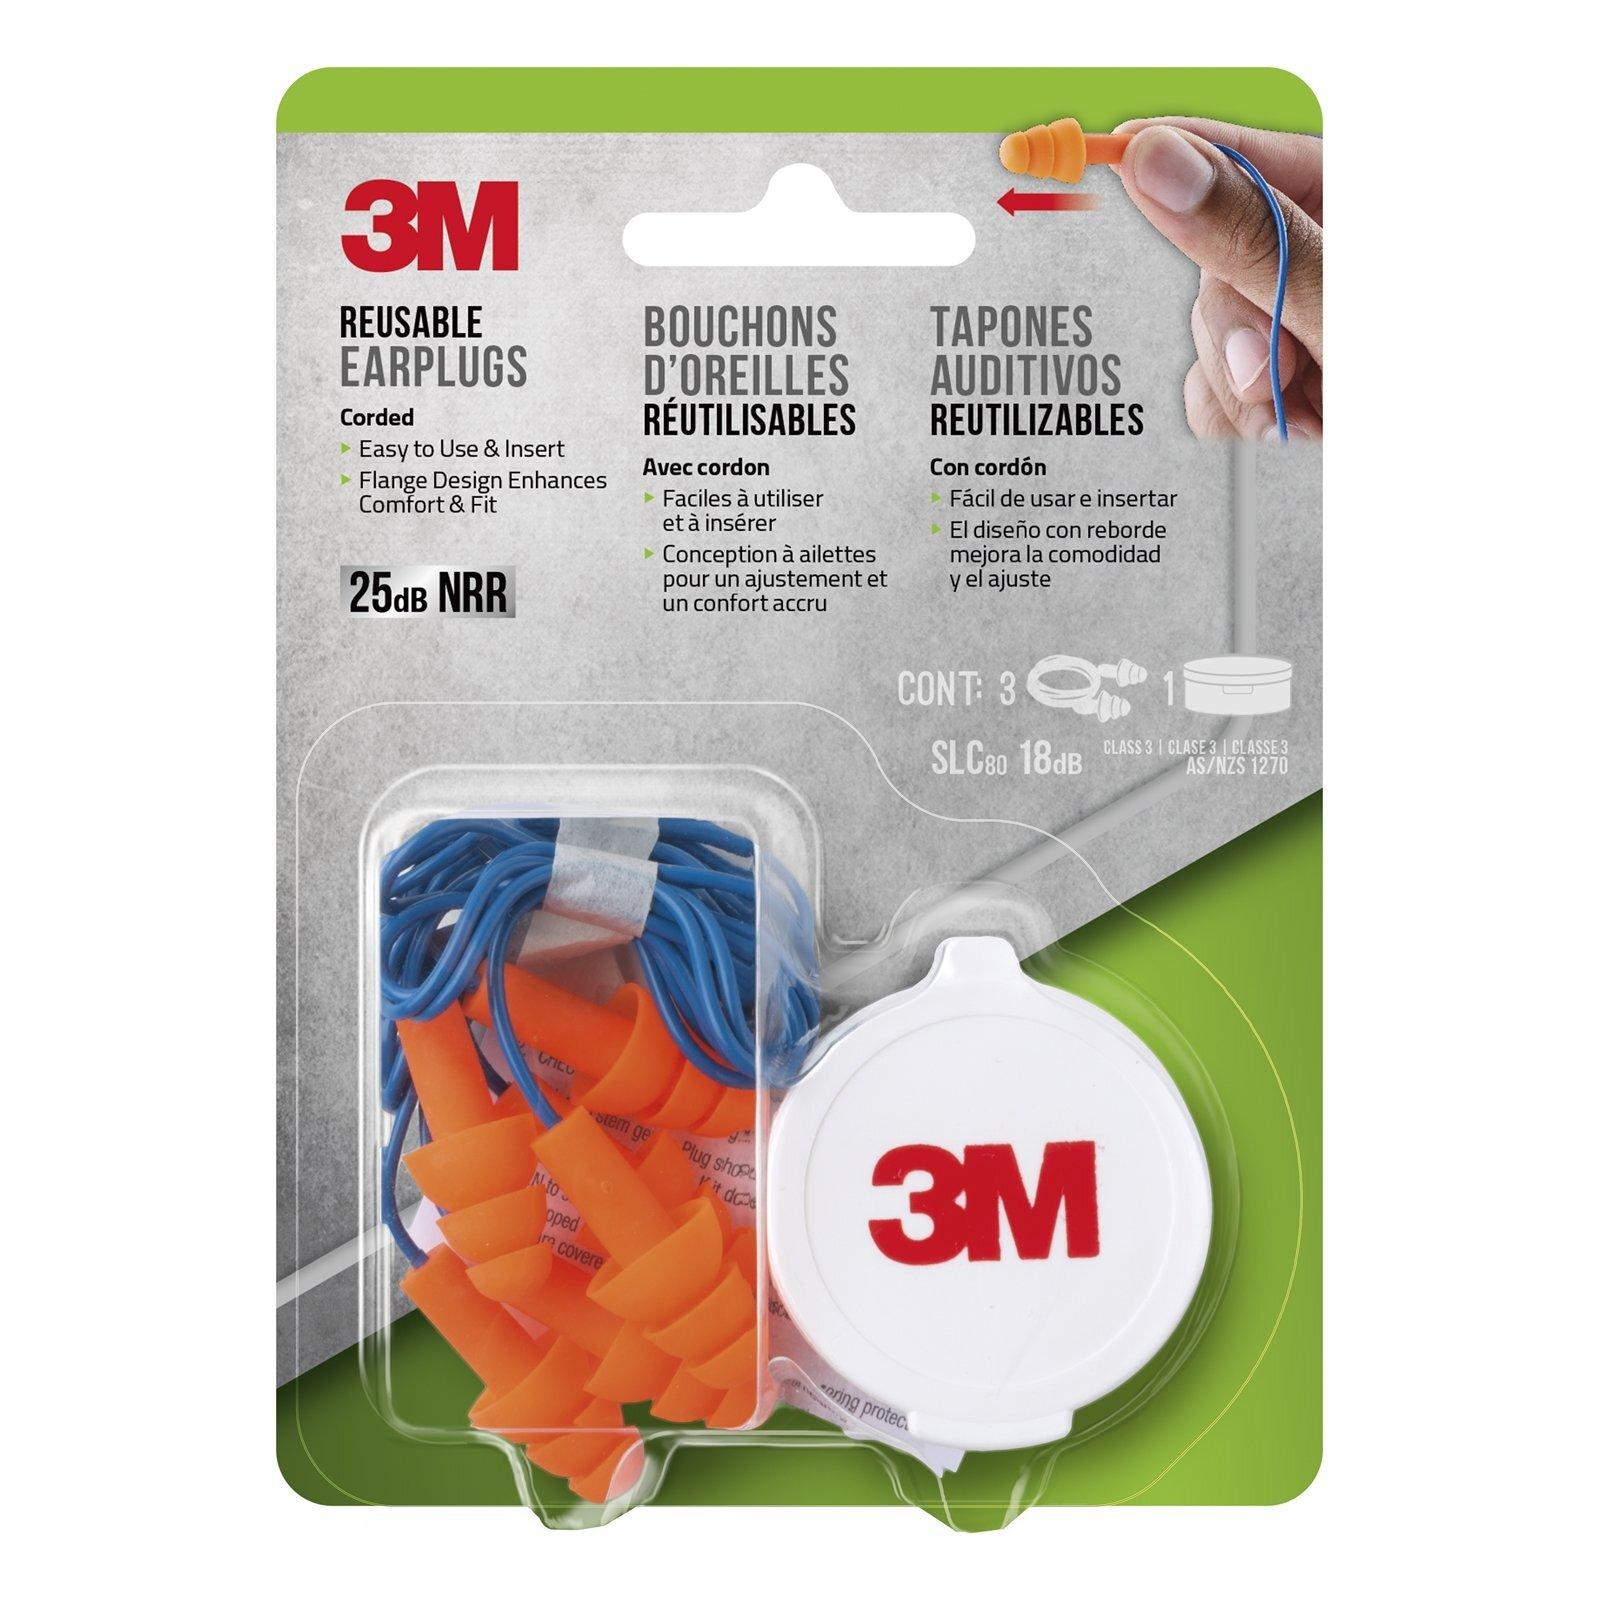 3M Lawn and Garden Reusable Ear Plugs Triple Flange